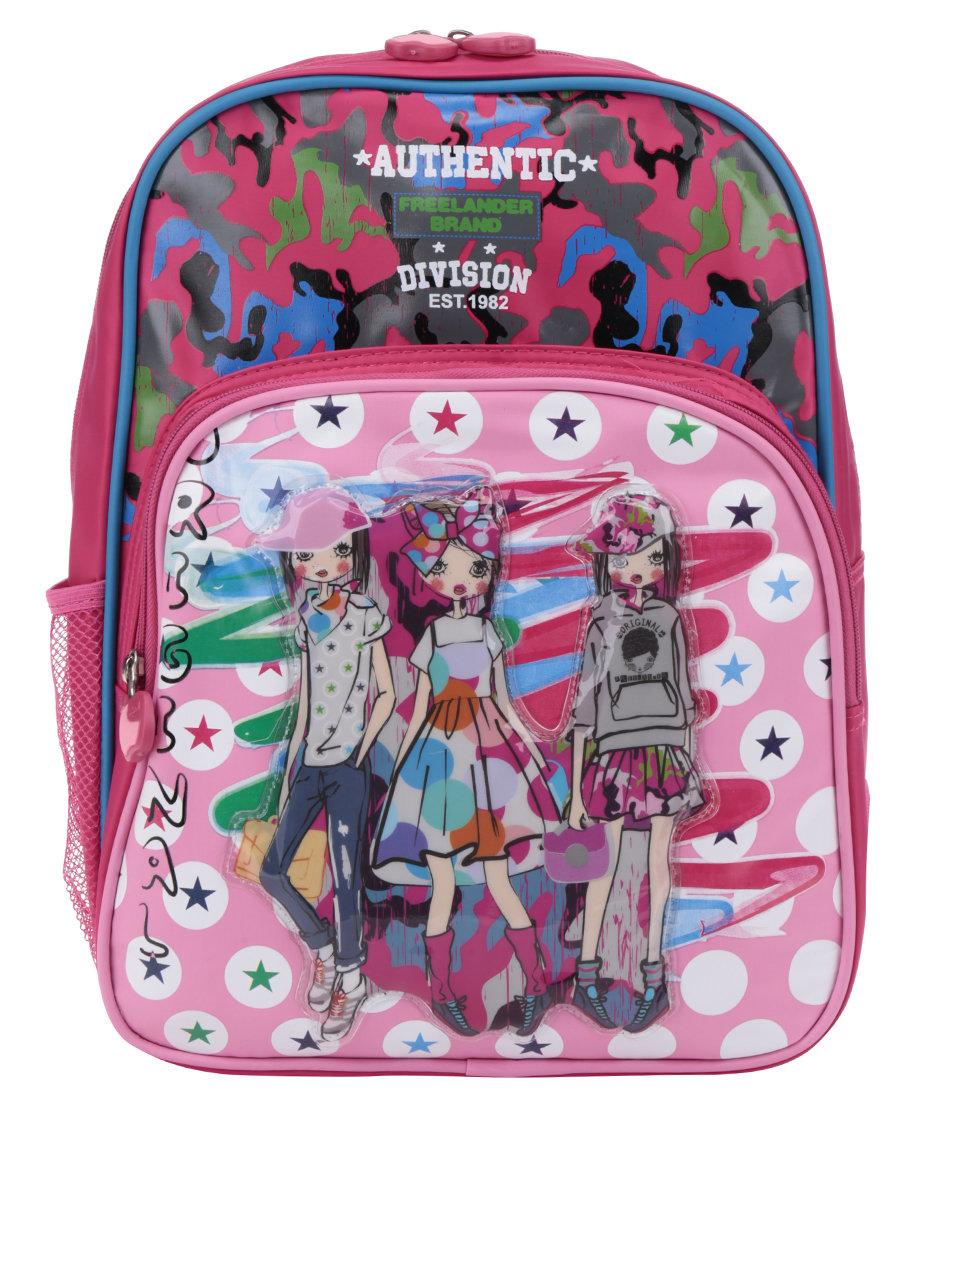 39c905d1ea8 Růžový holčičí vzorovaný batoh s 3D potiskem Freelander Authentic Single ...